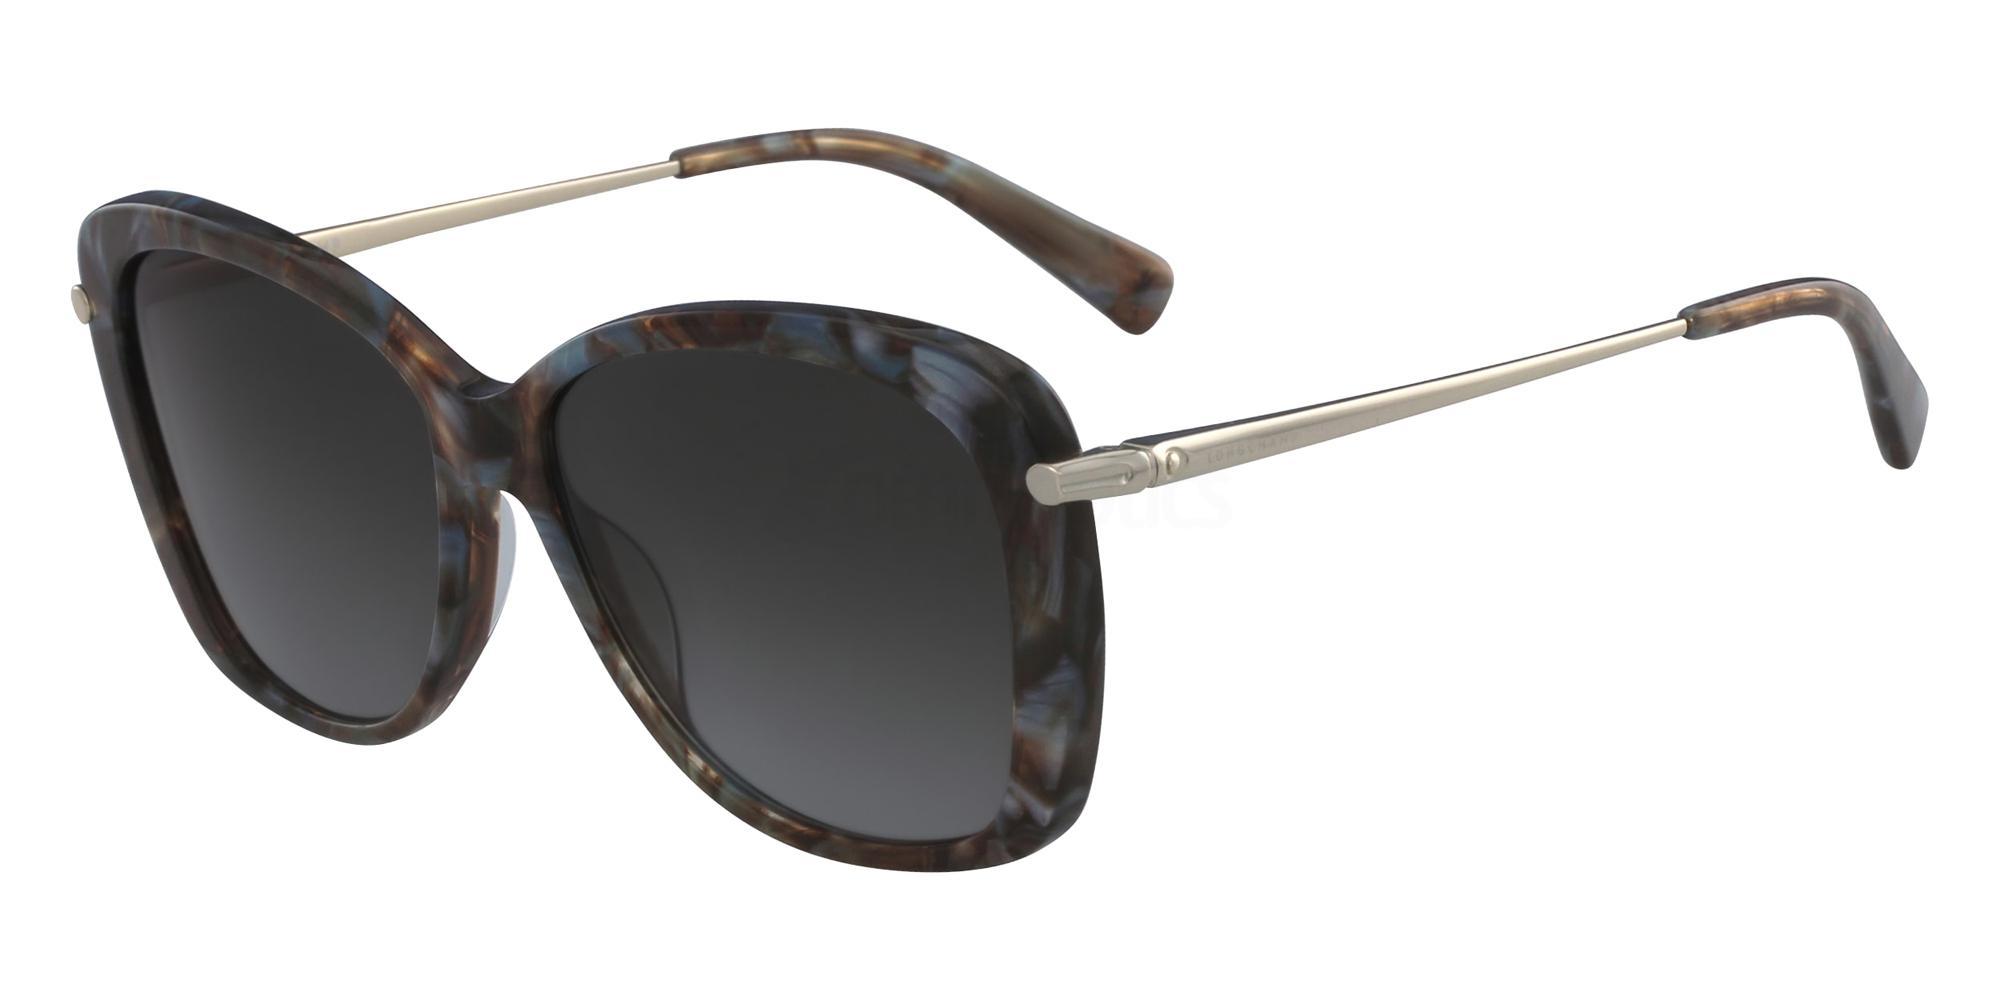 004 LO616S Sunglasses, LONGCHAMP